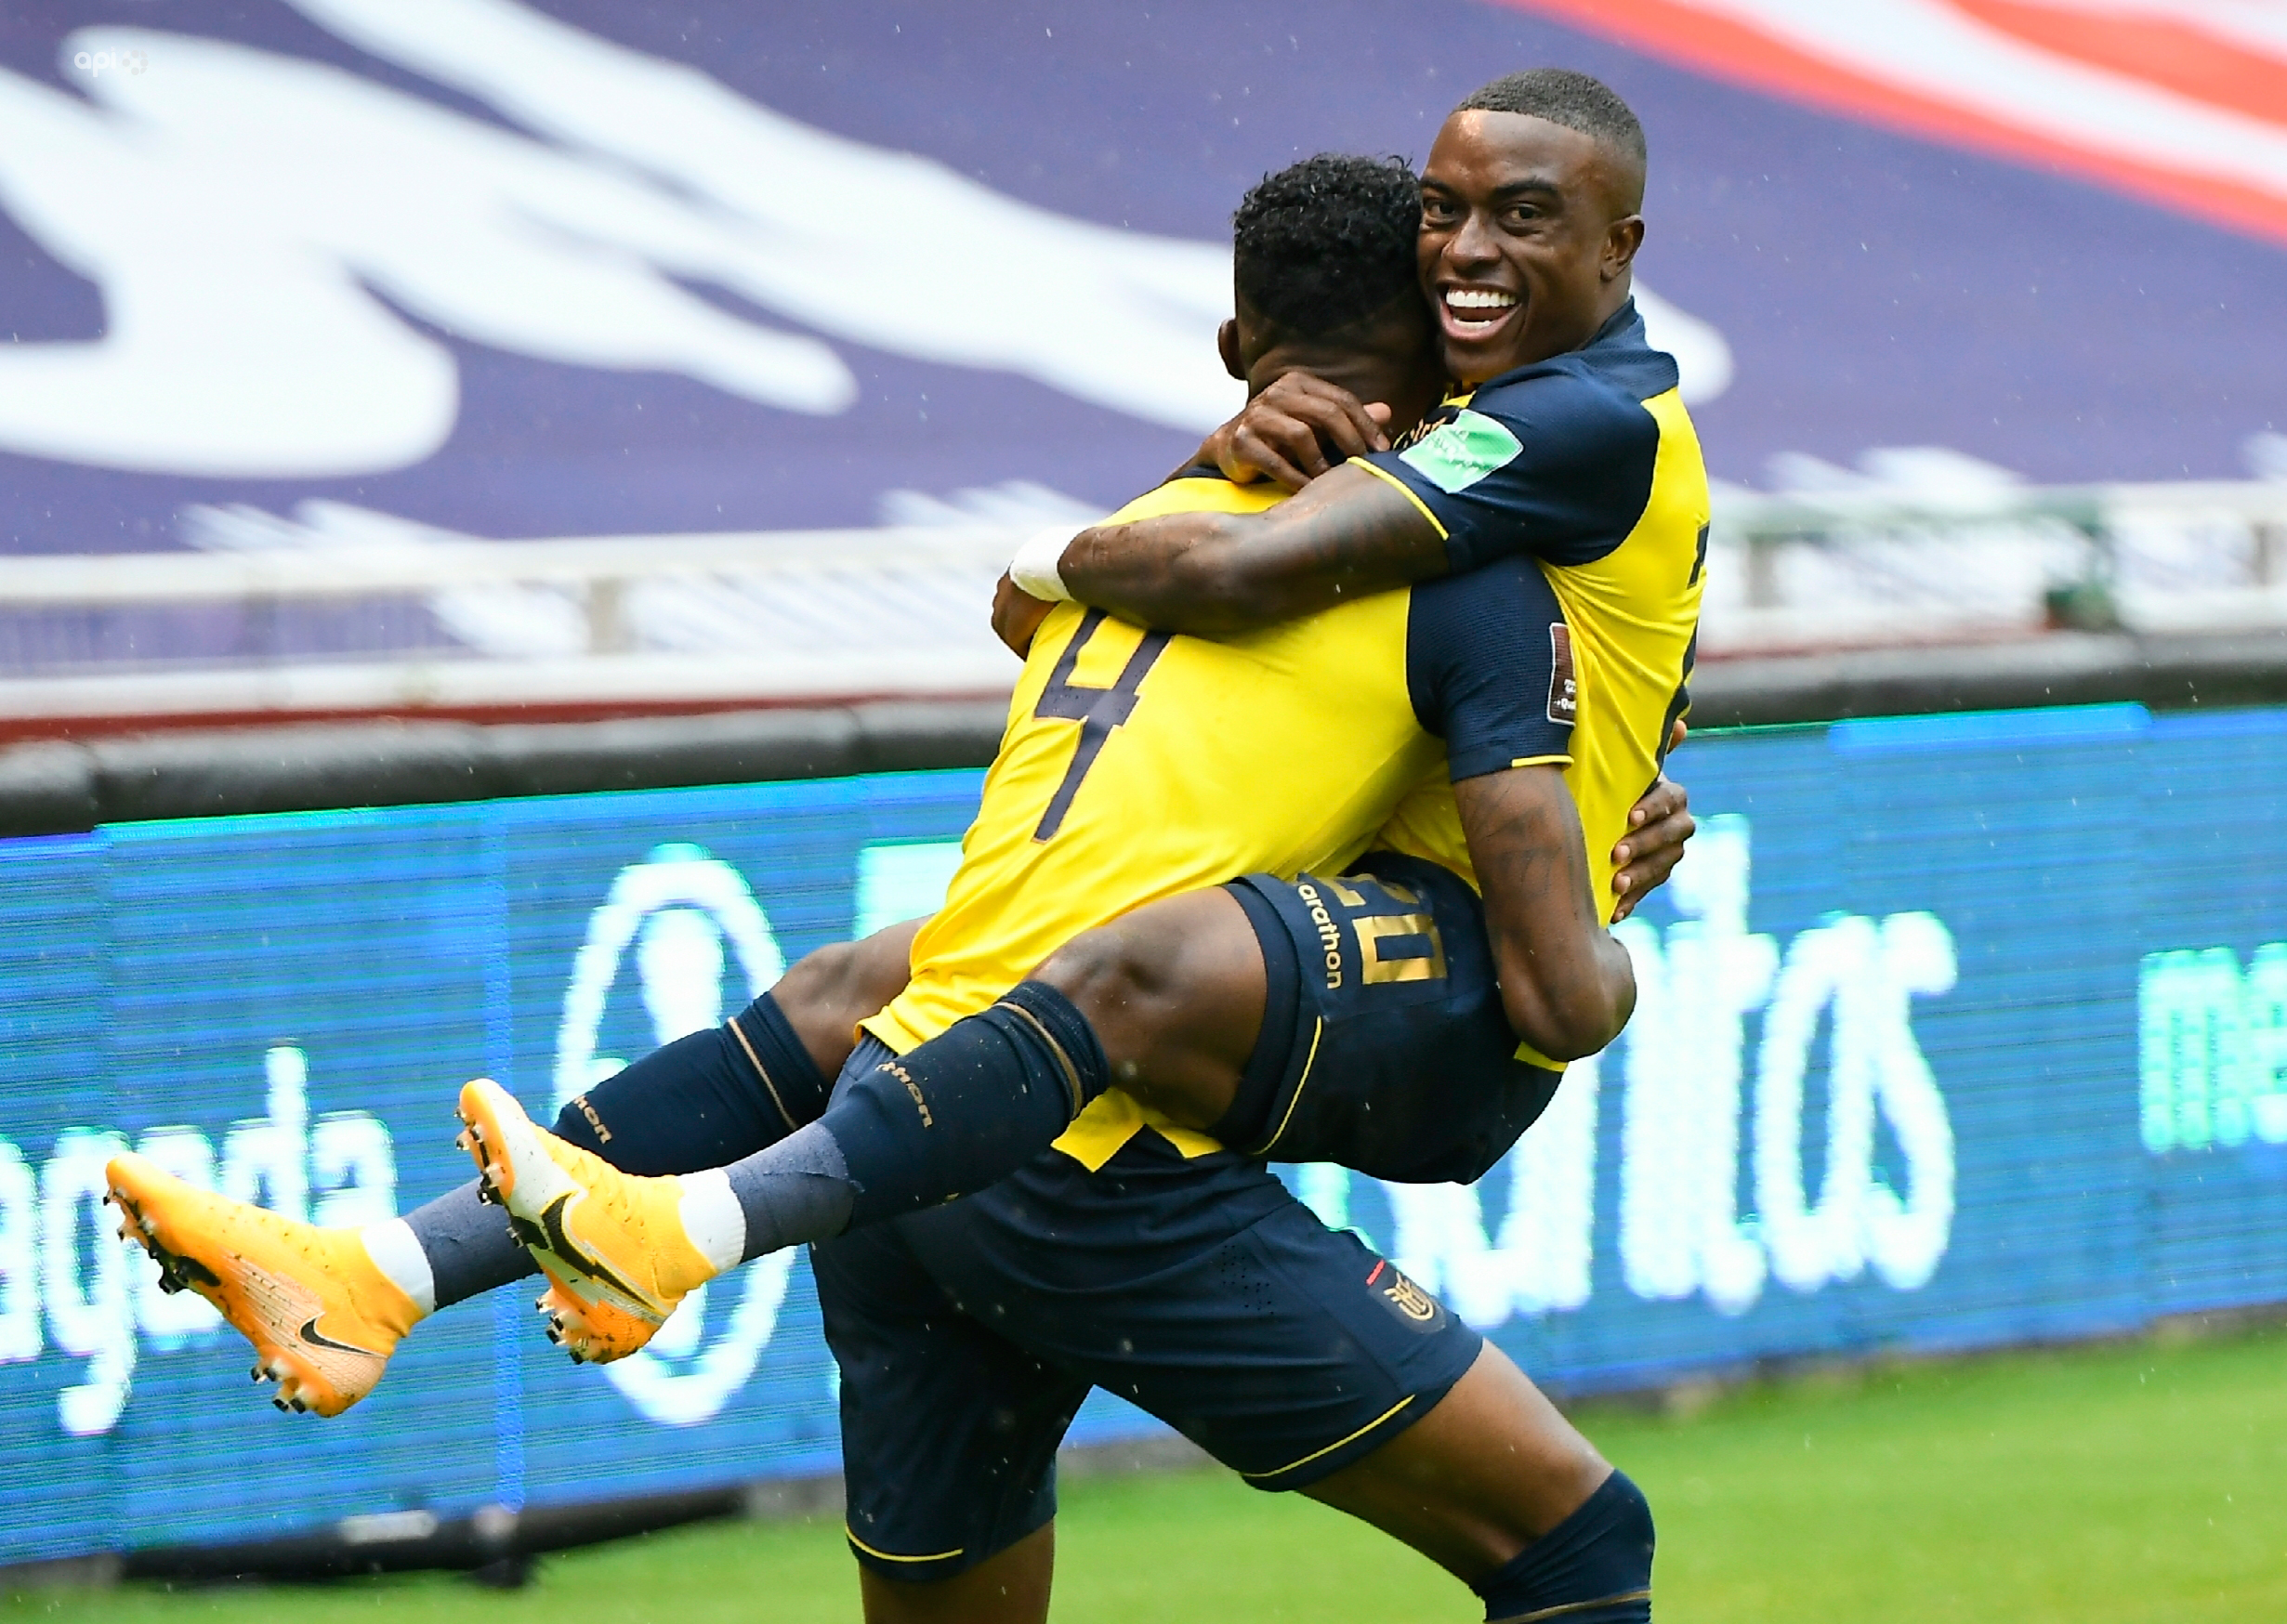 Se vivió una intensa jornada de las Eliminatorias Sudamericanas